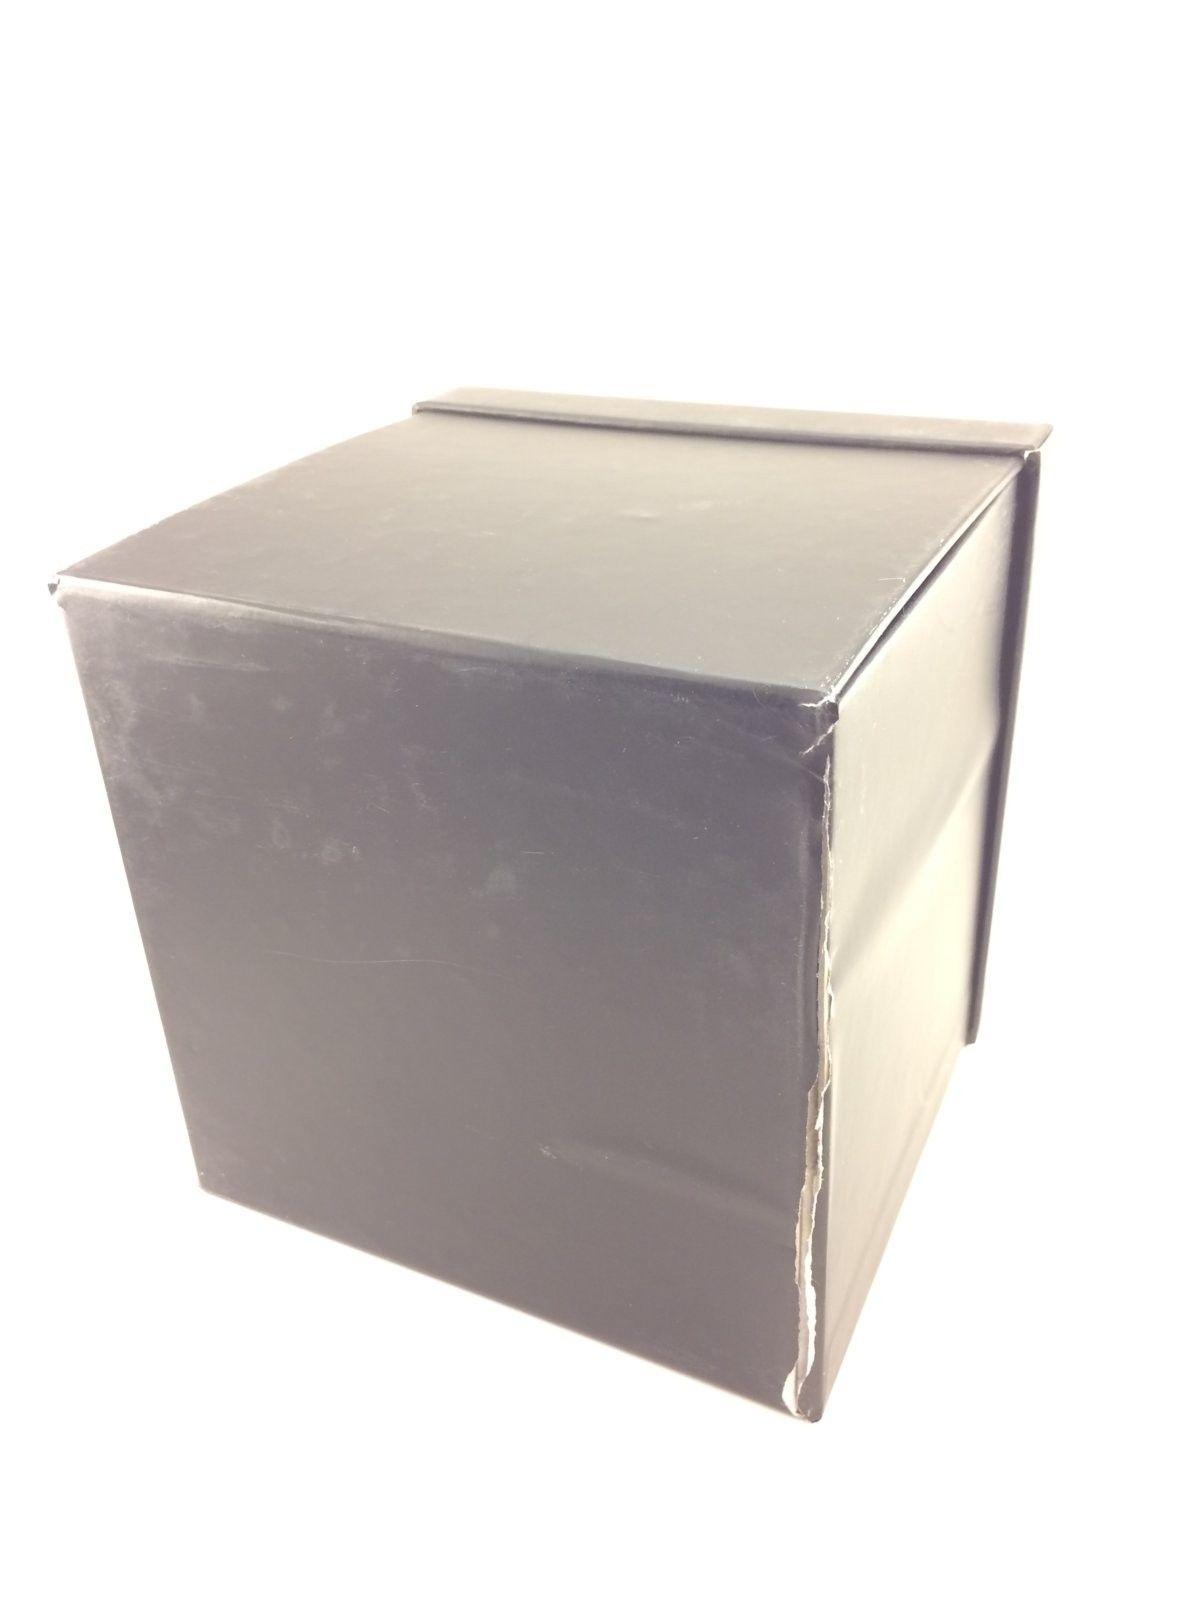 Minute Machine Wooden Box - MM box 699.JPG